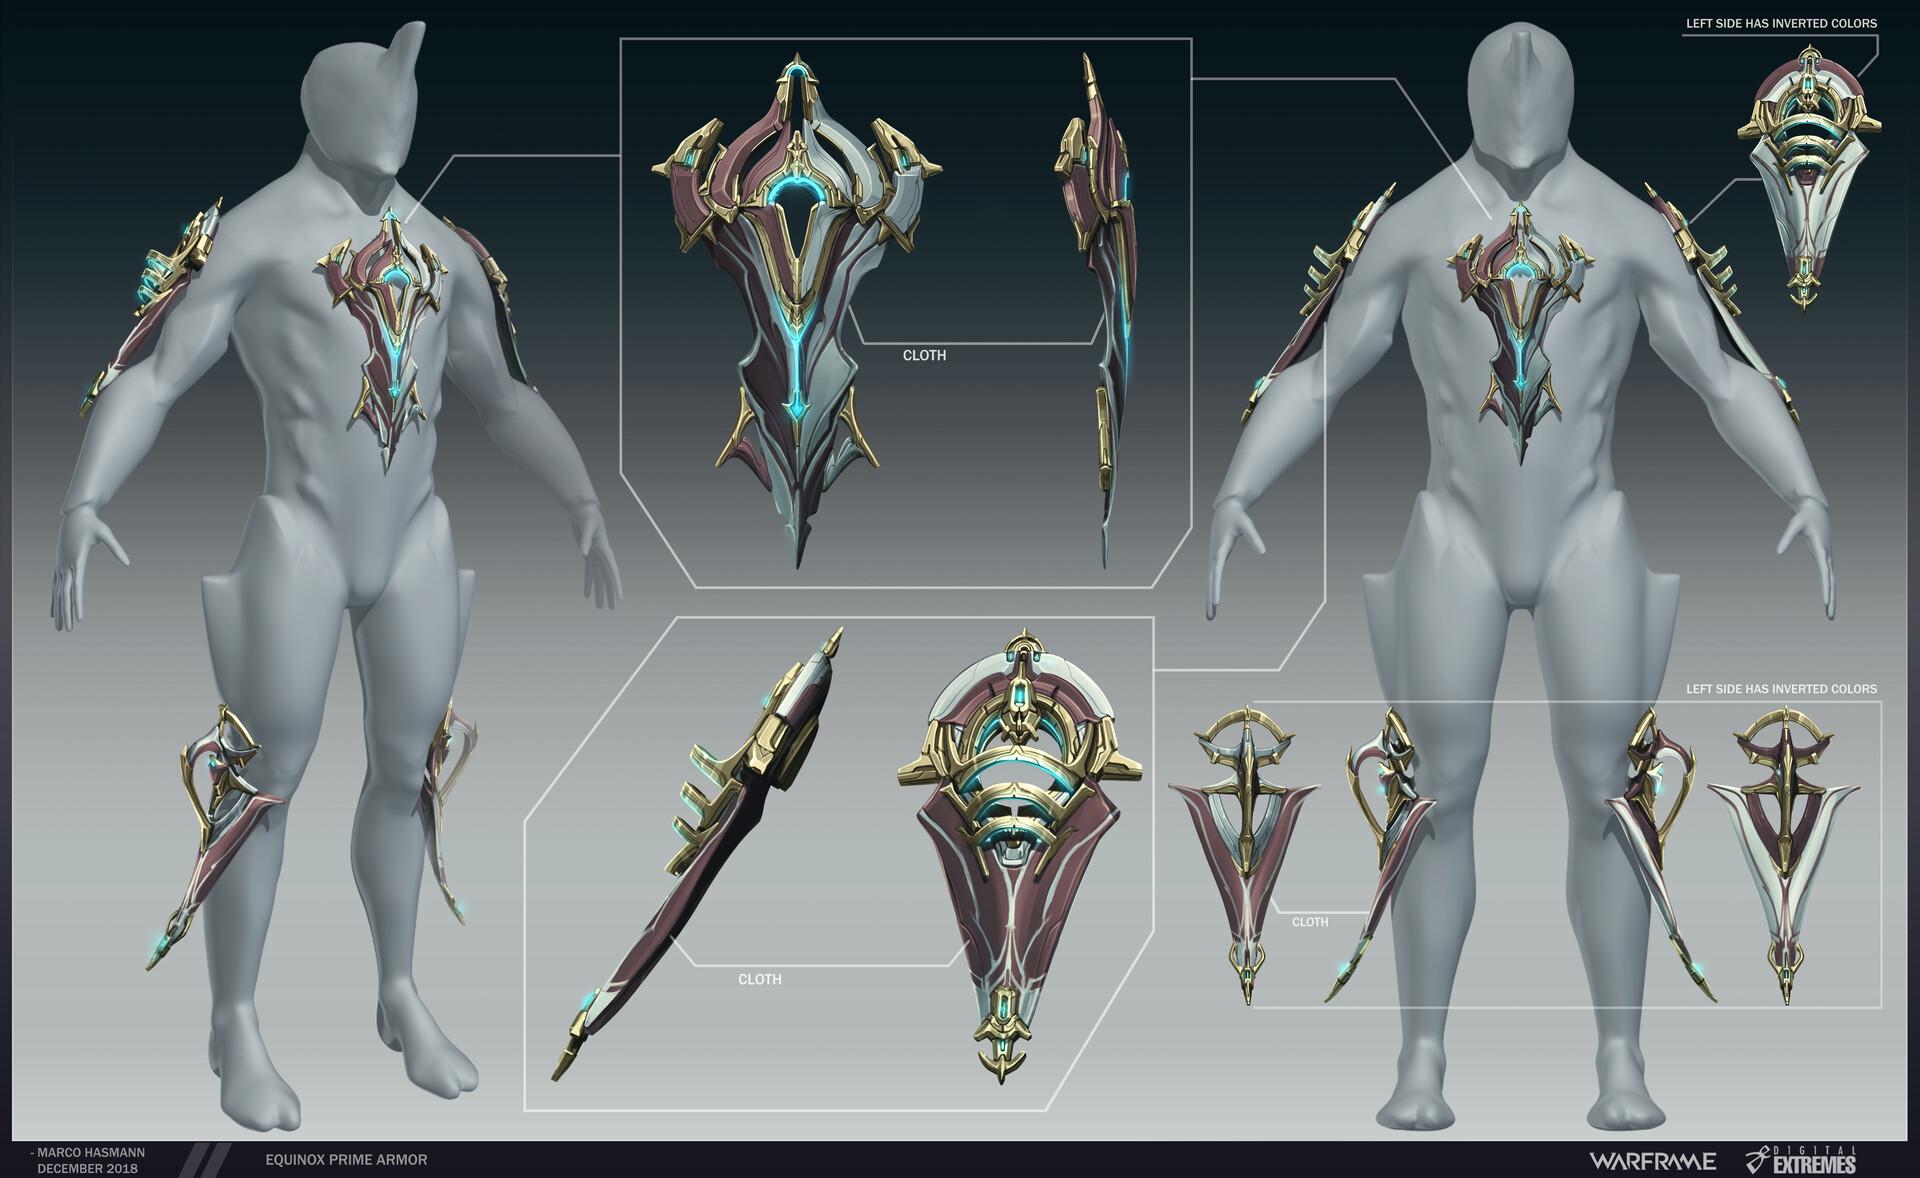 Marco hasmann equinox prime armor final